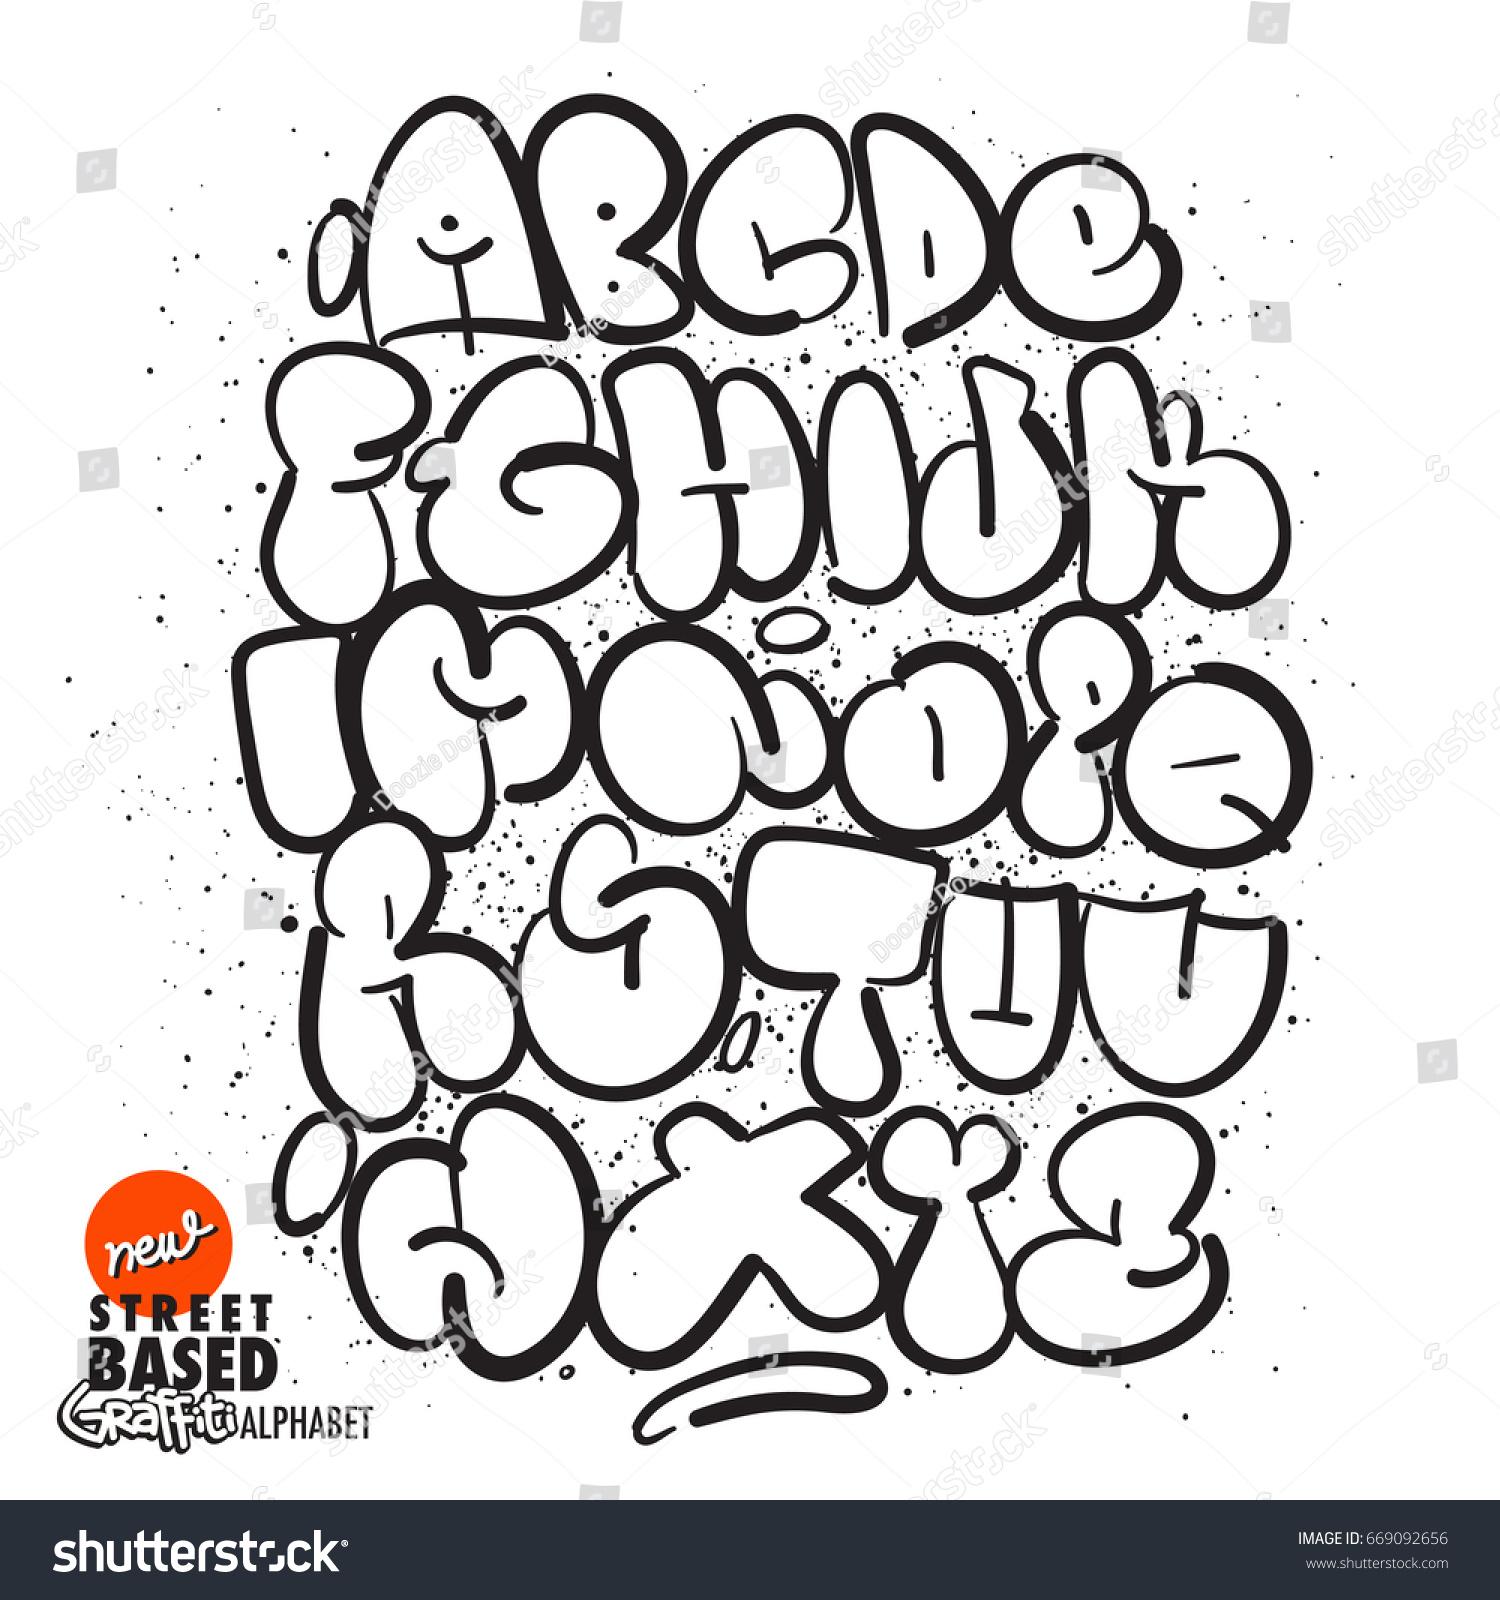 Handmade bubble graffiti alphabet